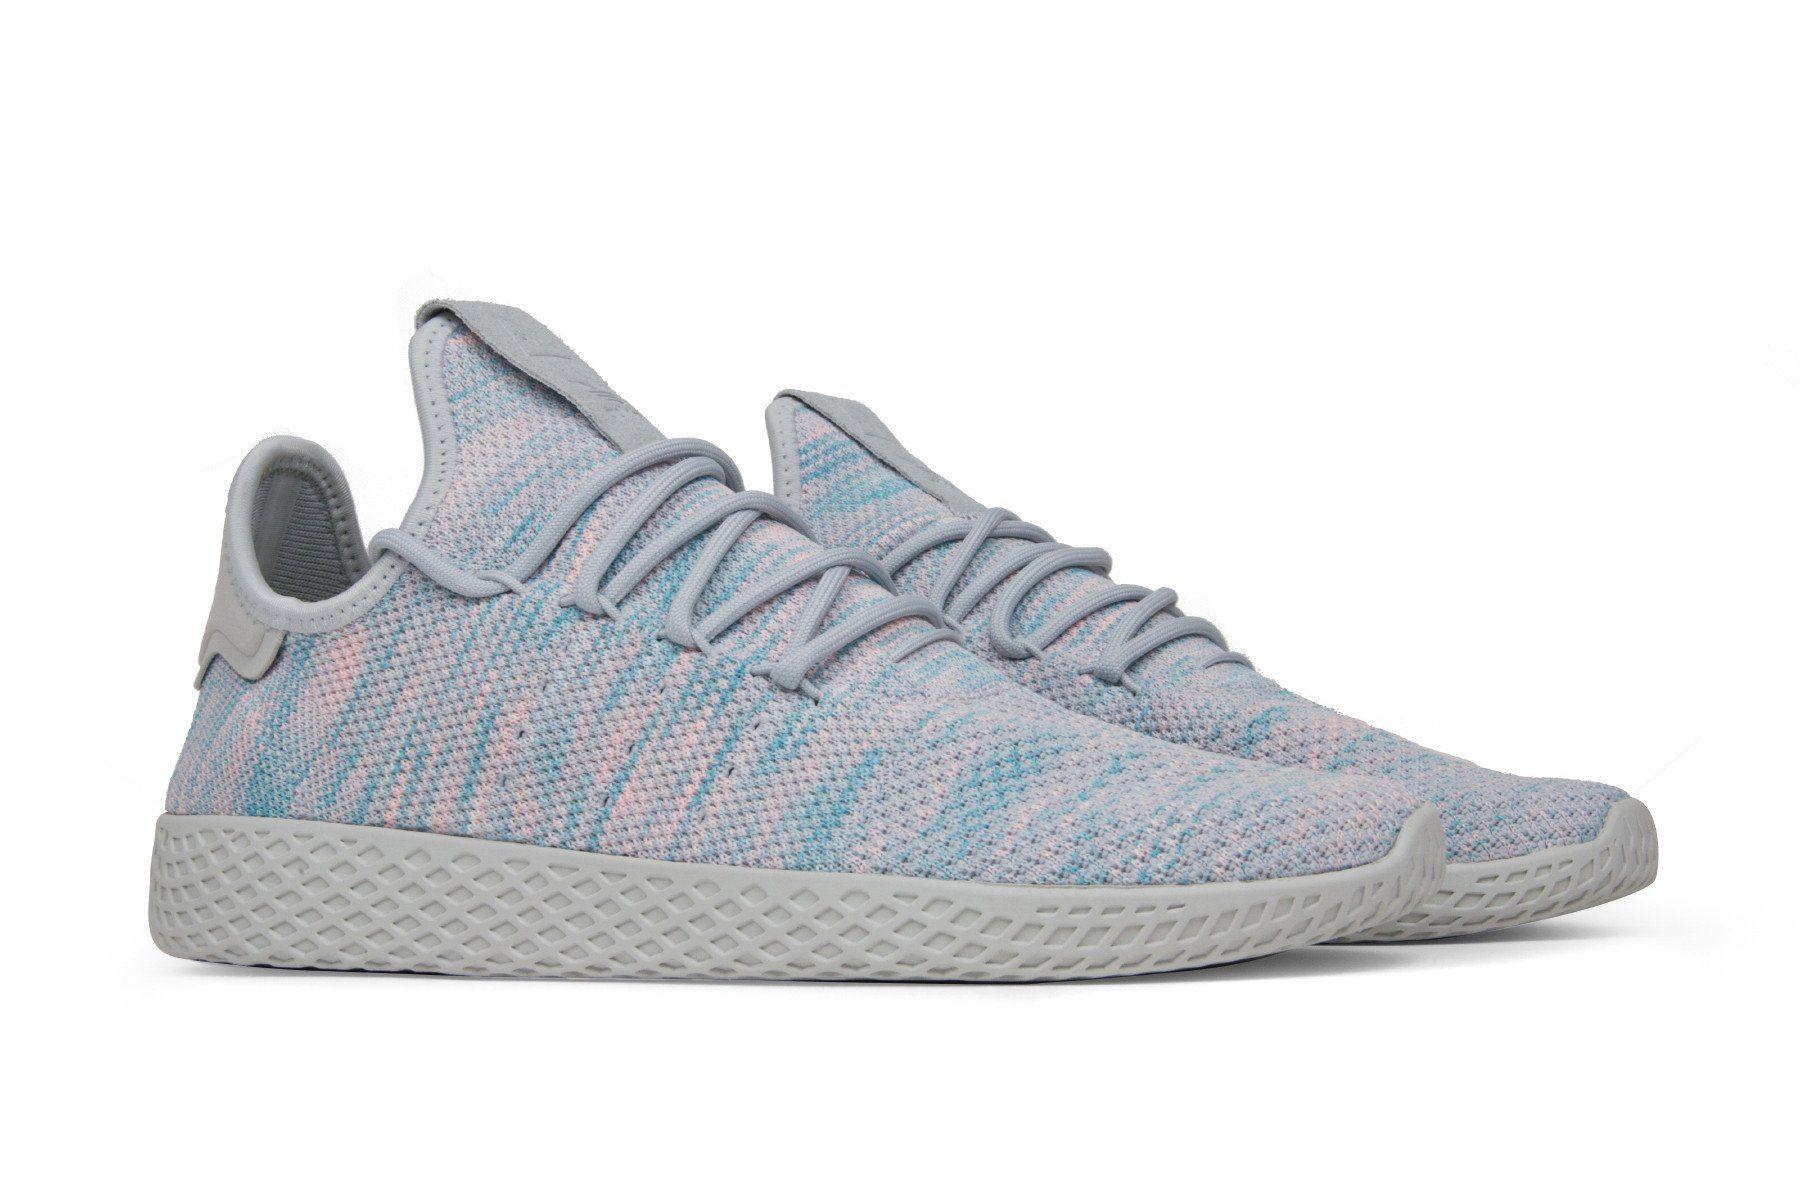 c94633480 Adidas Originals x Pharrell Williams  Tennis HU  - Light Blue ...